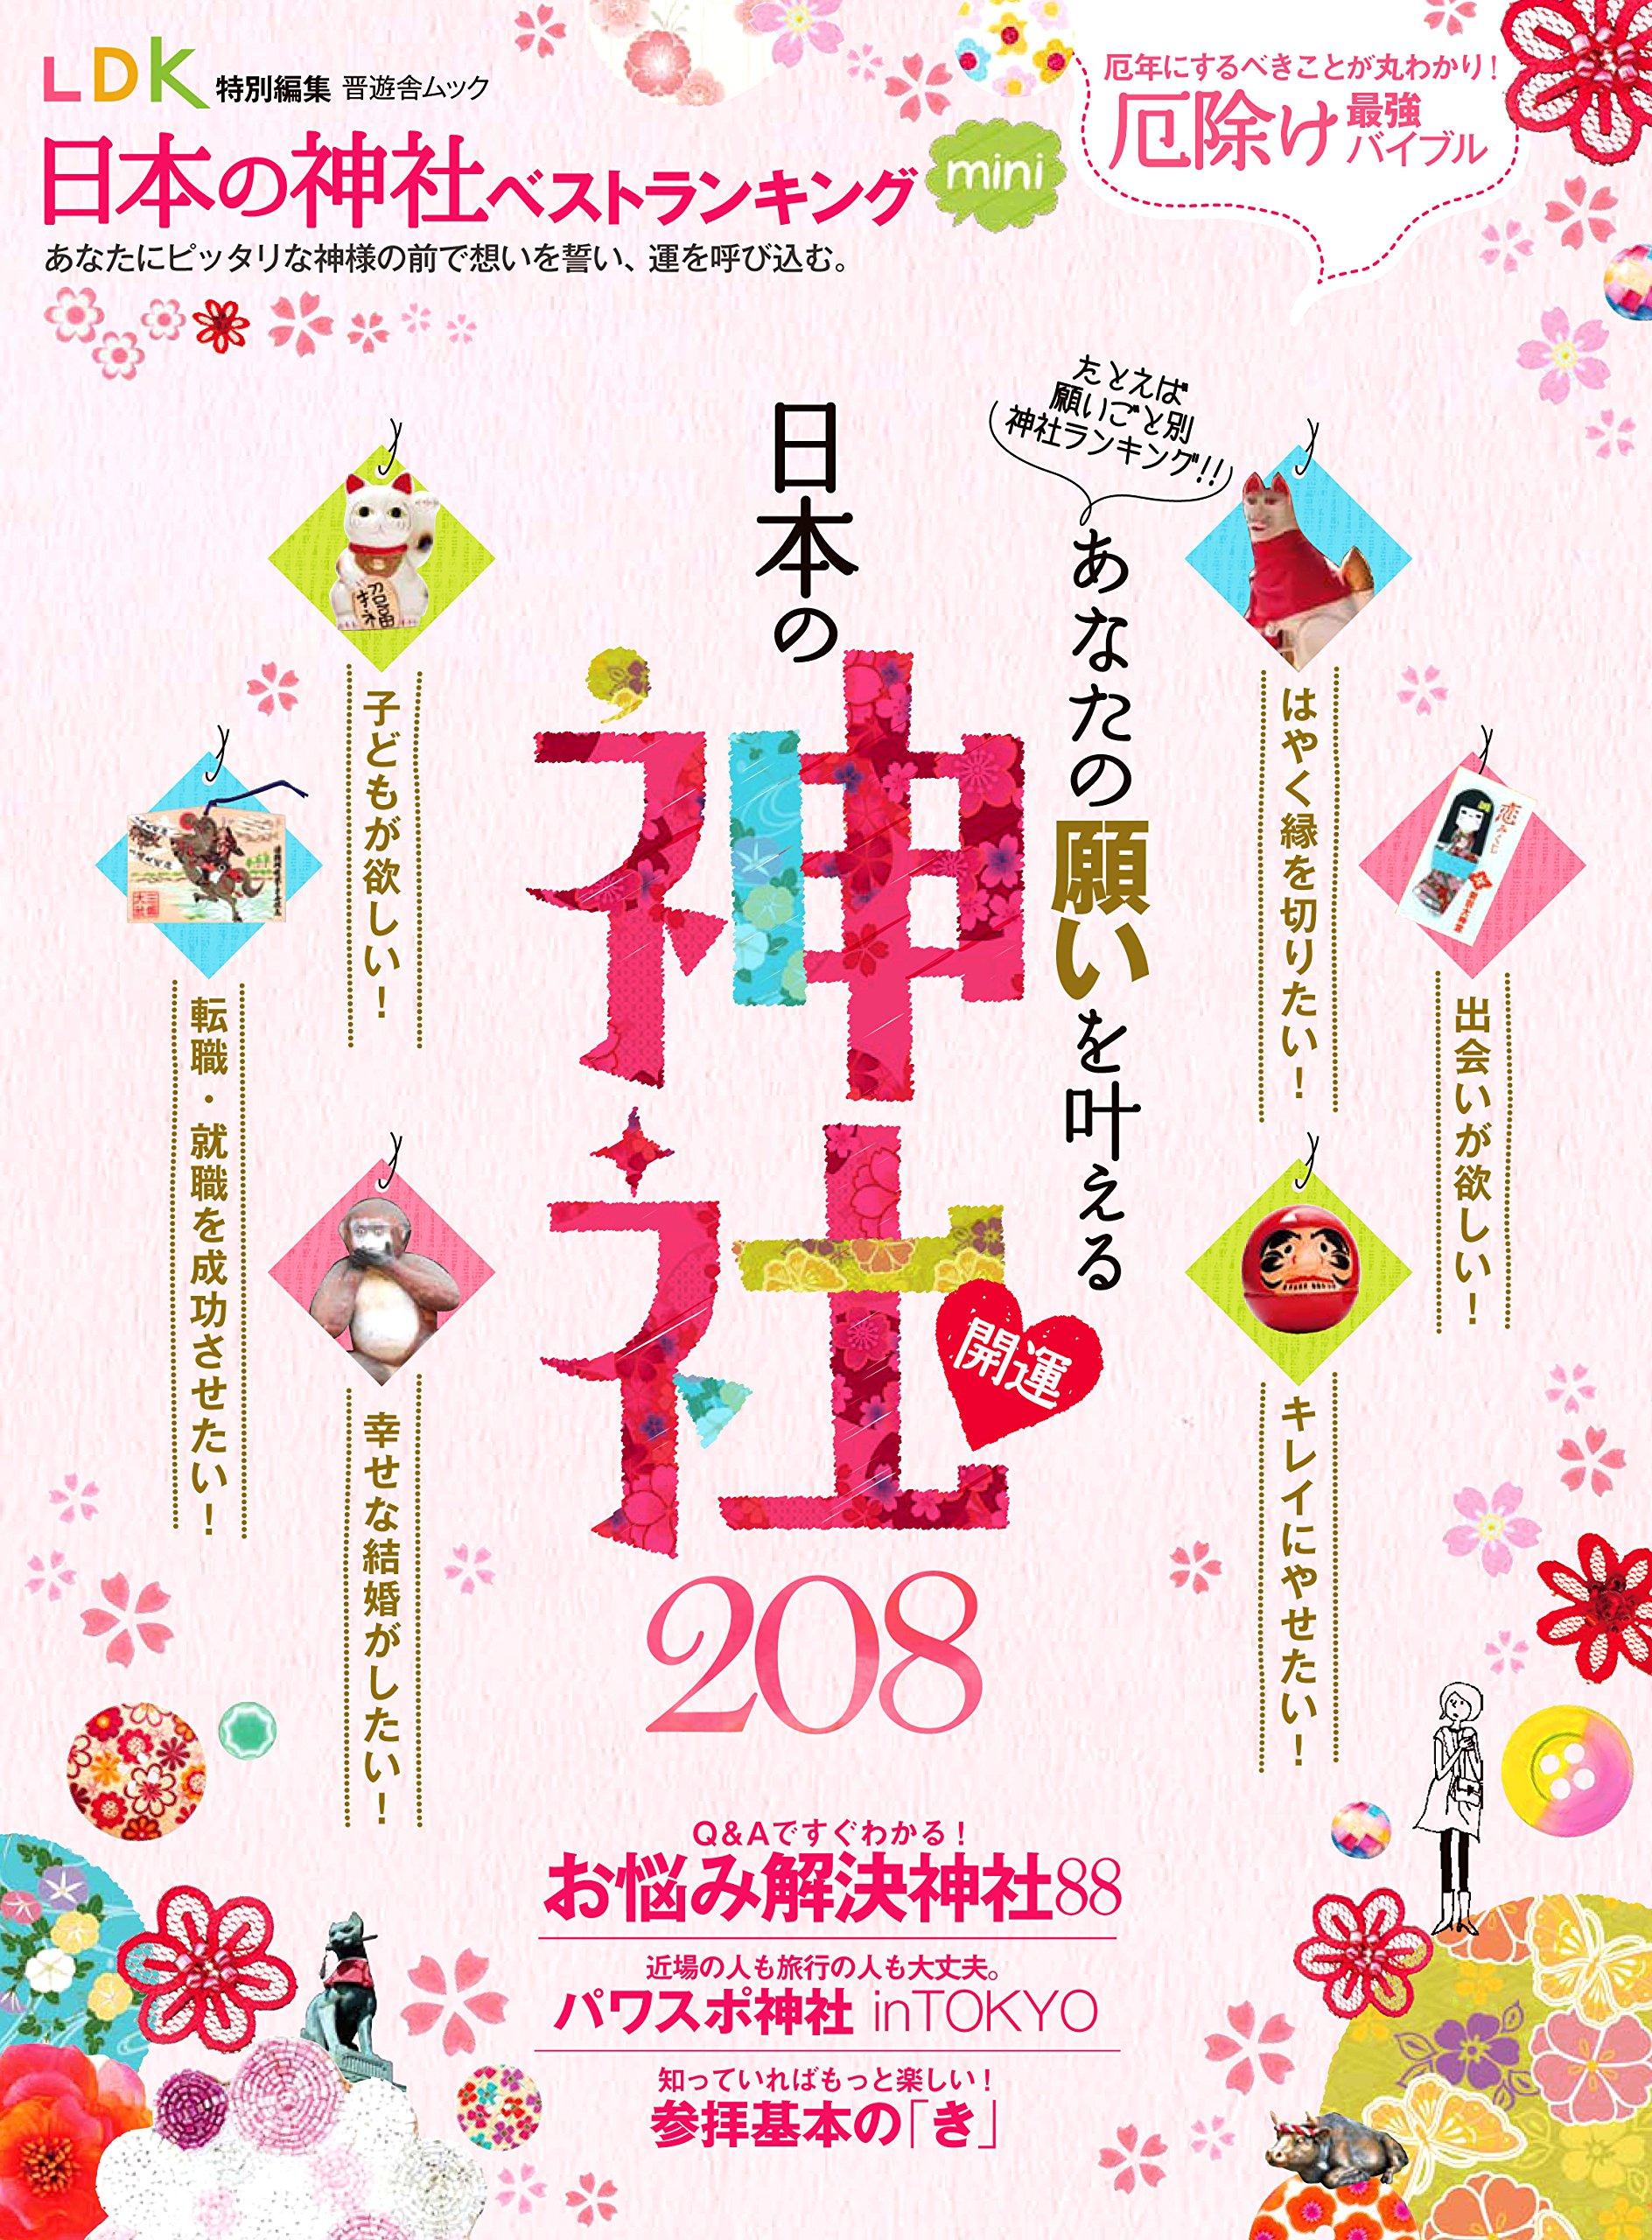 Download Japan shrine ranking the best mini (RM) ePub fb2 book